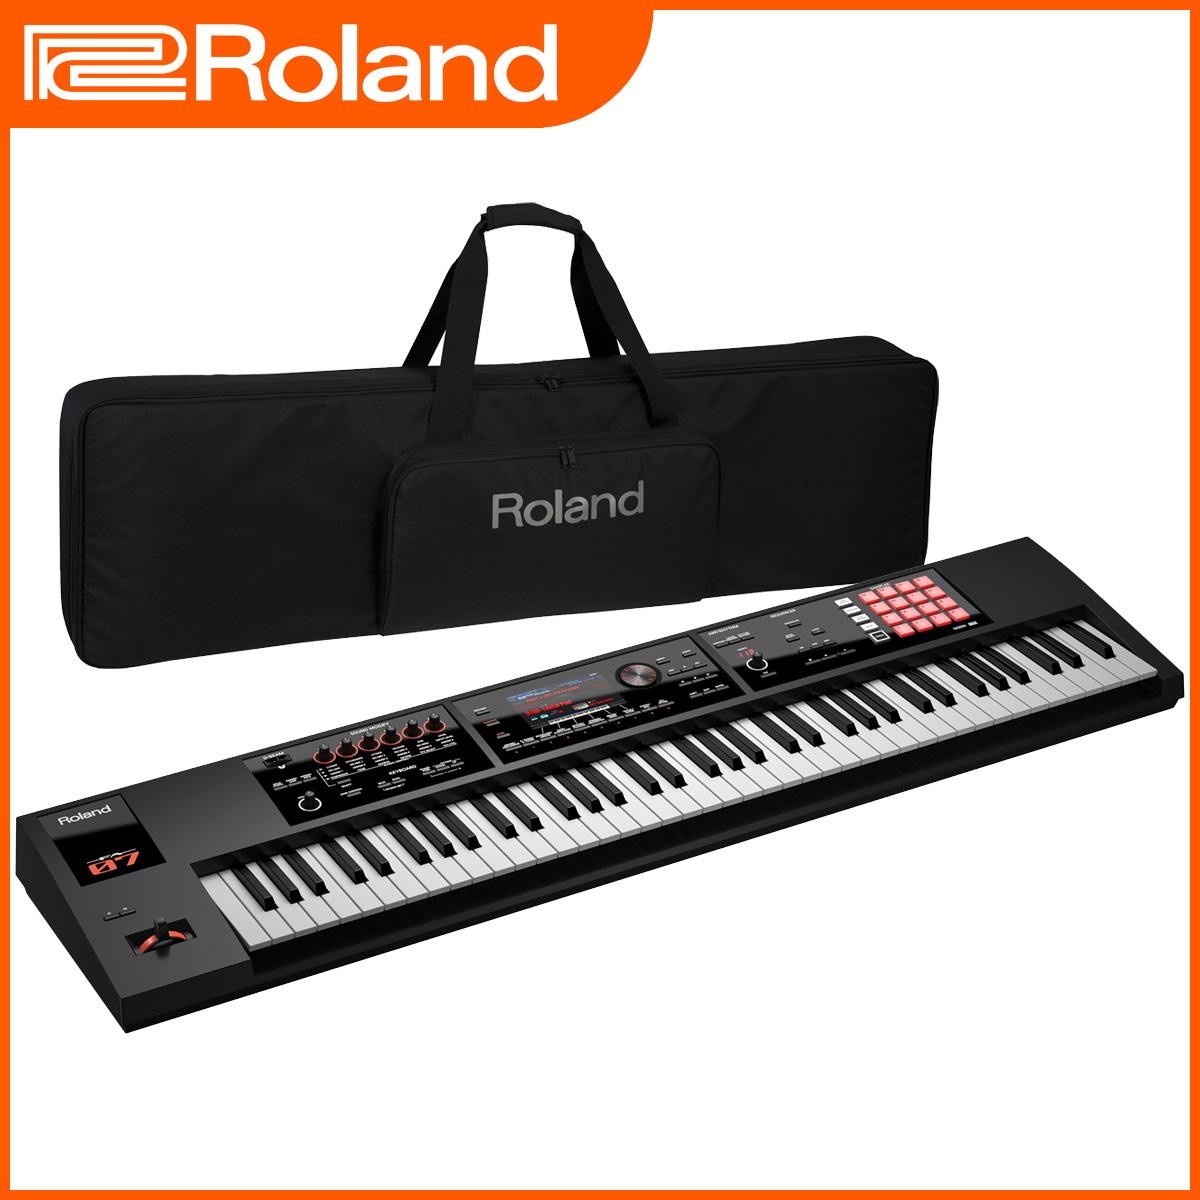 Roland ローランド / FA-07 Music Workstation 【ケースセット!】【オーバーレイシート付属】76鍵盤 シンセサイザー 【YRK】《予約注文/10月下旬入荷予定》